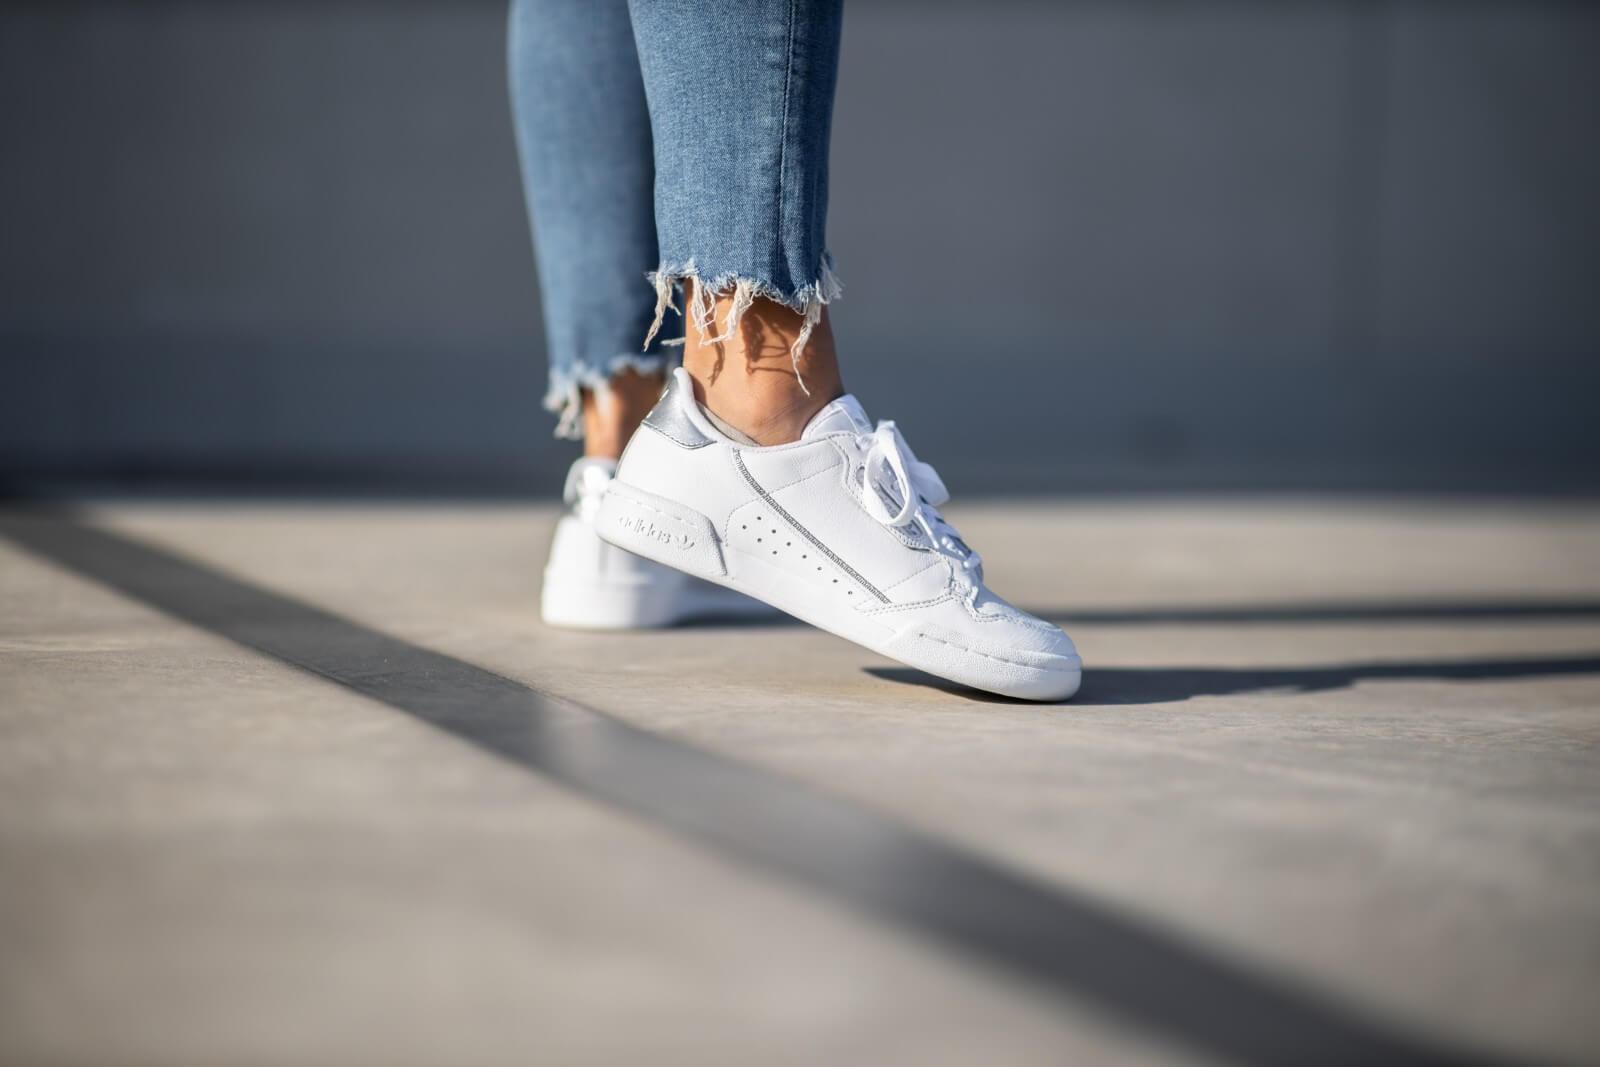 Adidas Women's Continental 80 Footwear White/Silver Metallic